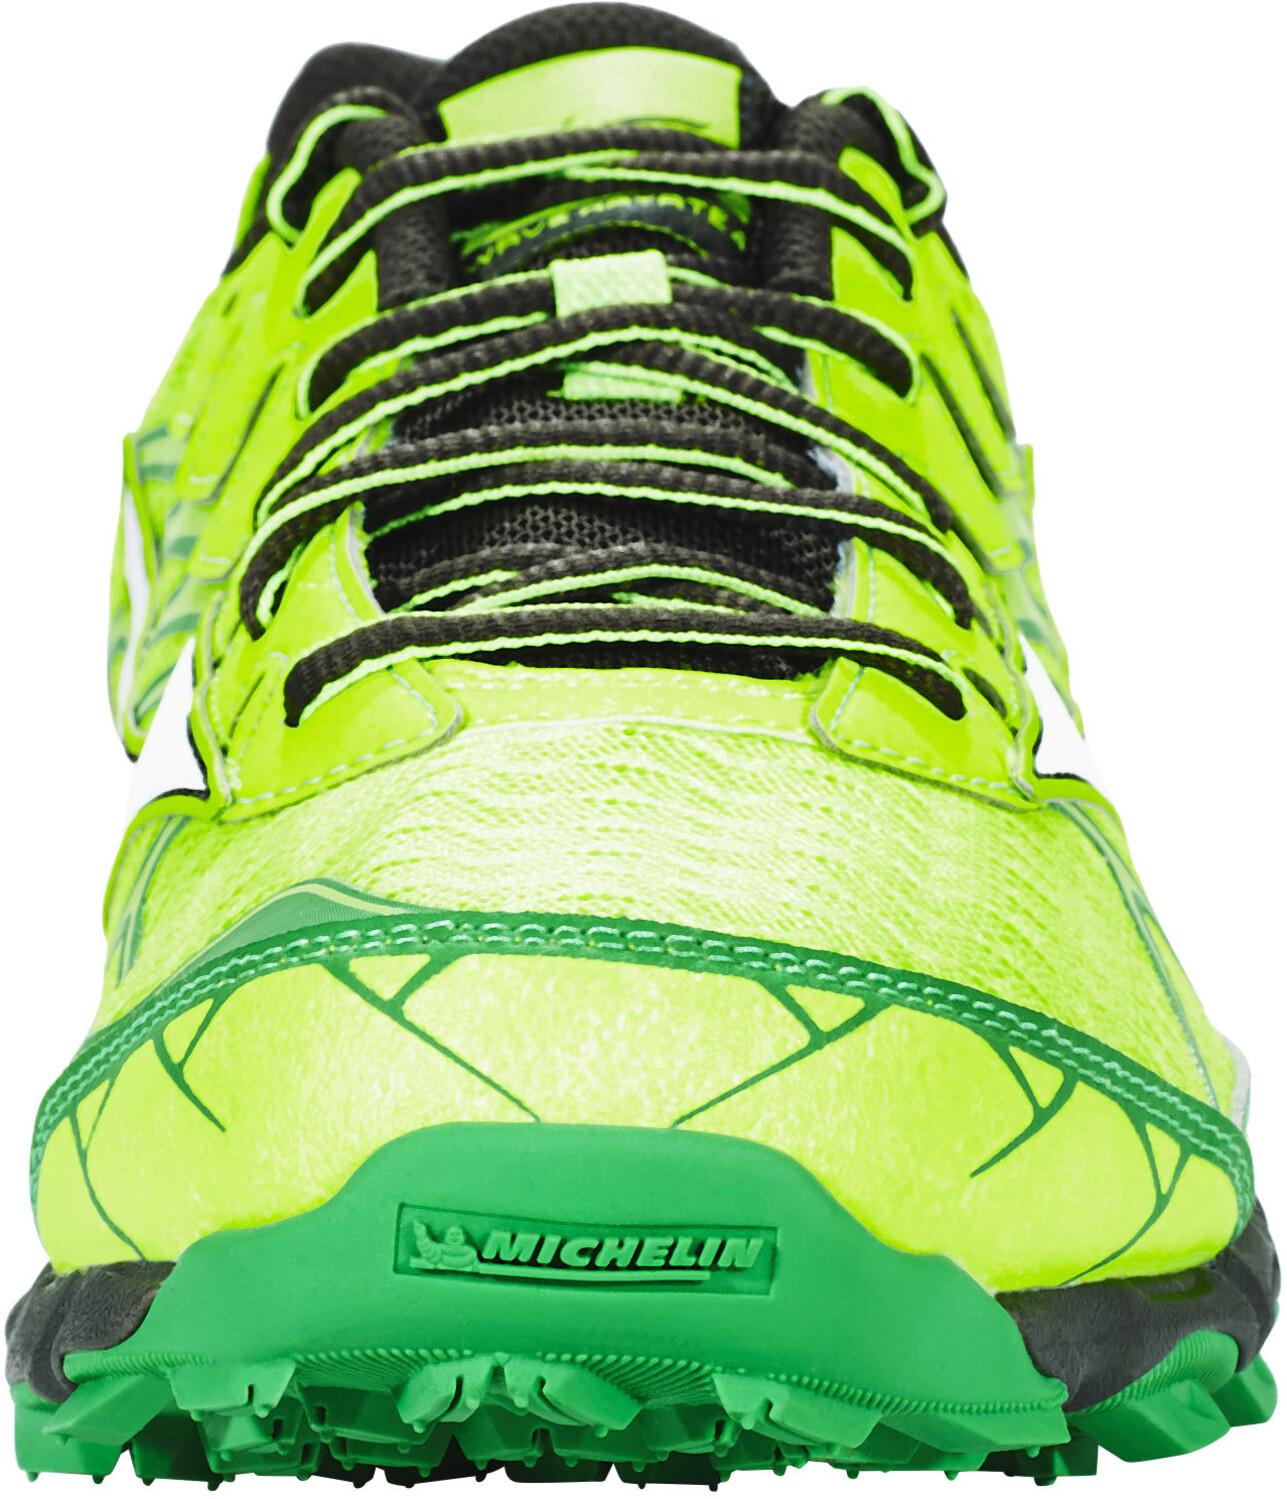 competitive price c51d2 1ebc5 Mizuno Wave Hayate 4 - Zapatillas running Hombre - verde